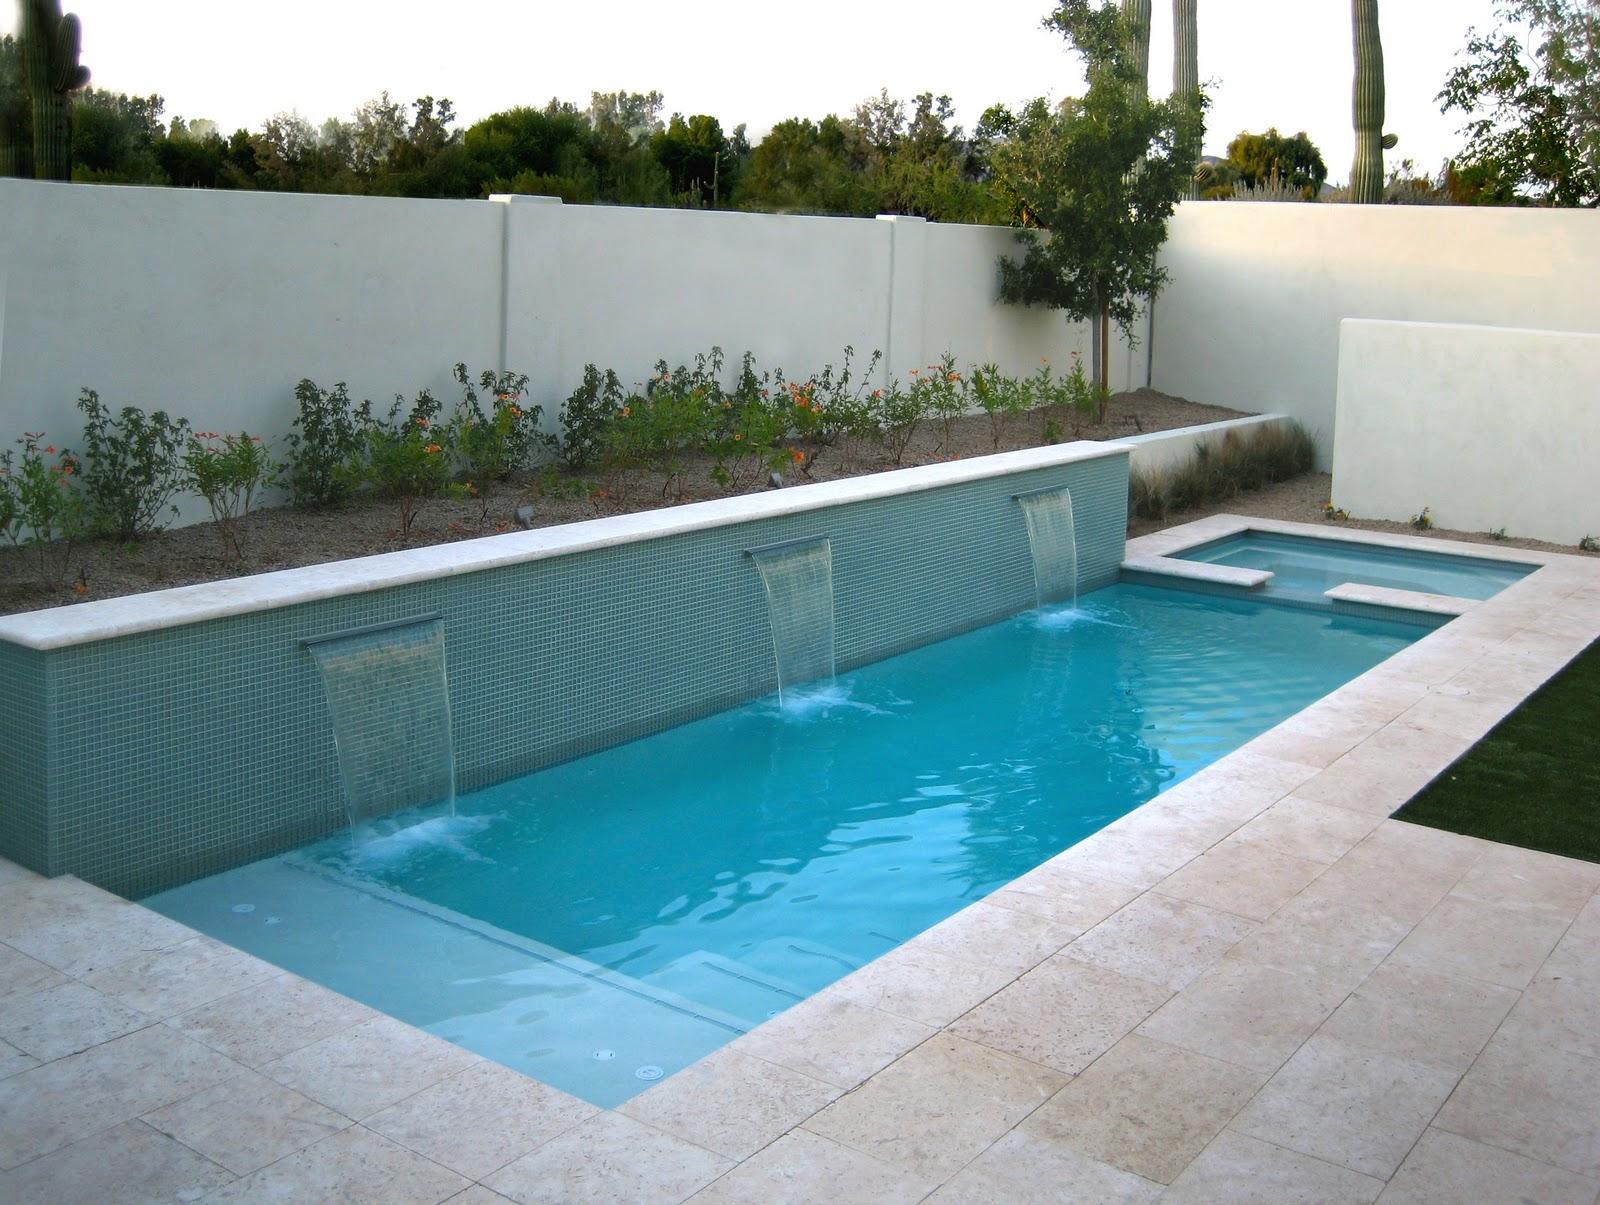 mini swimming pool ideas photo - 8